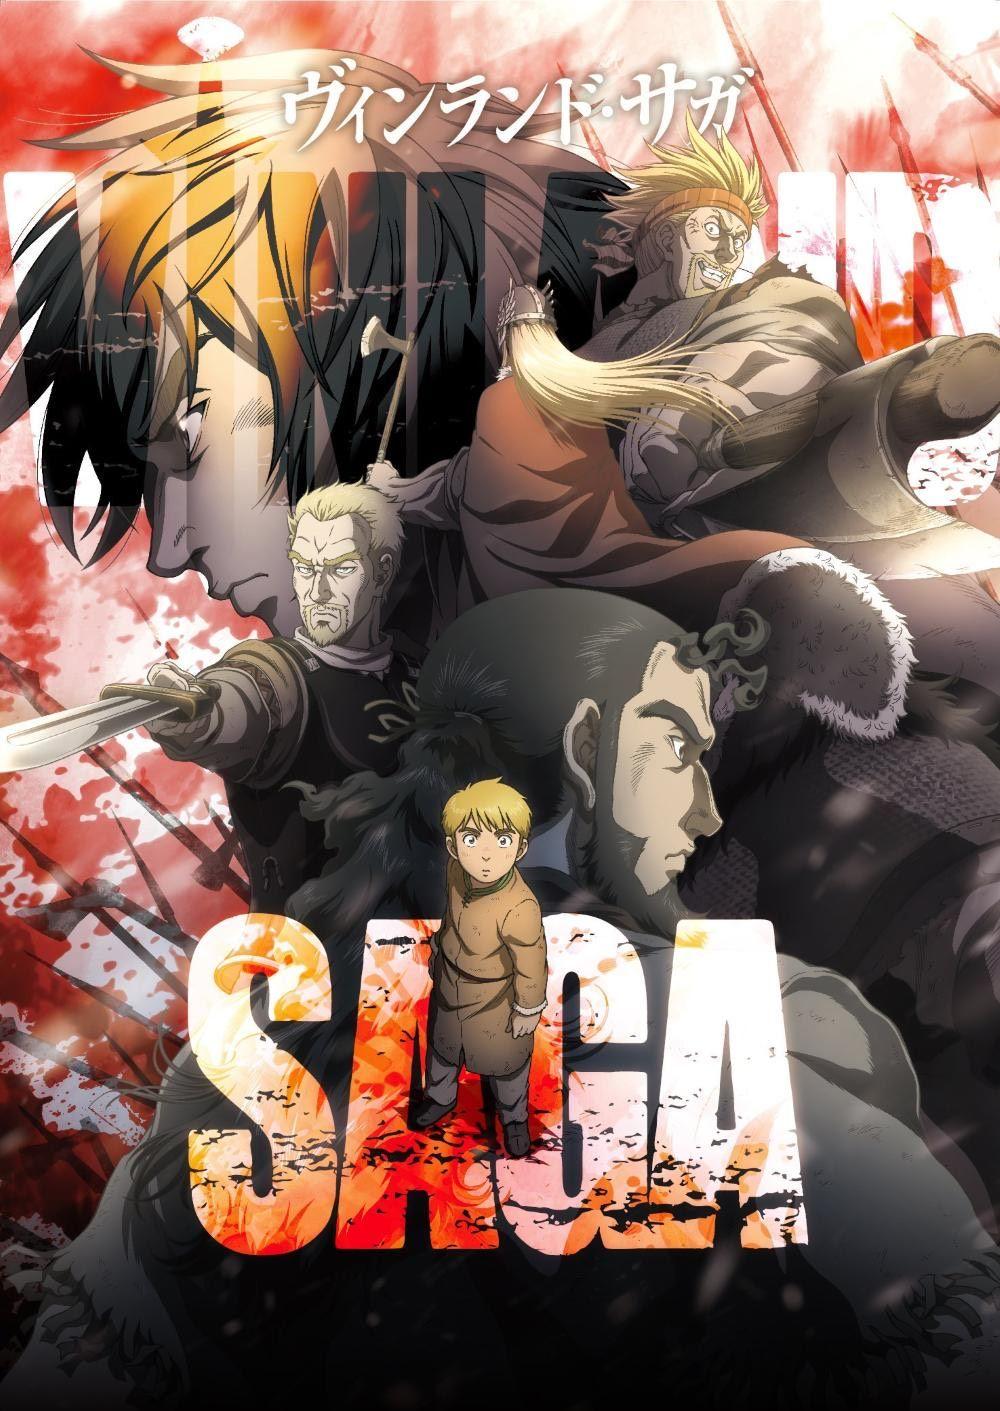 Animating anime Jordan Bayes talks Vinland Saga, Boruto